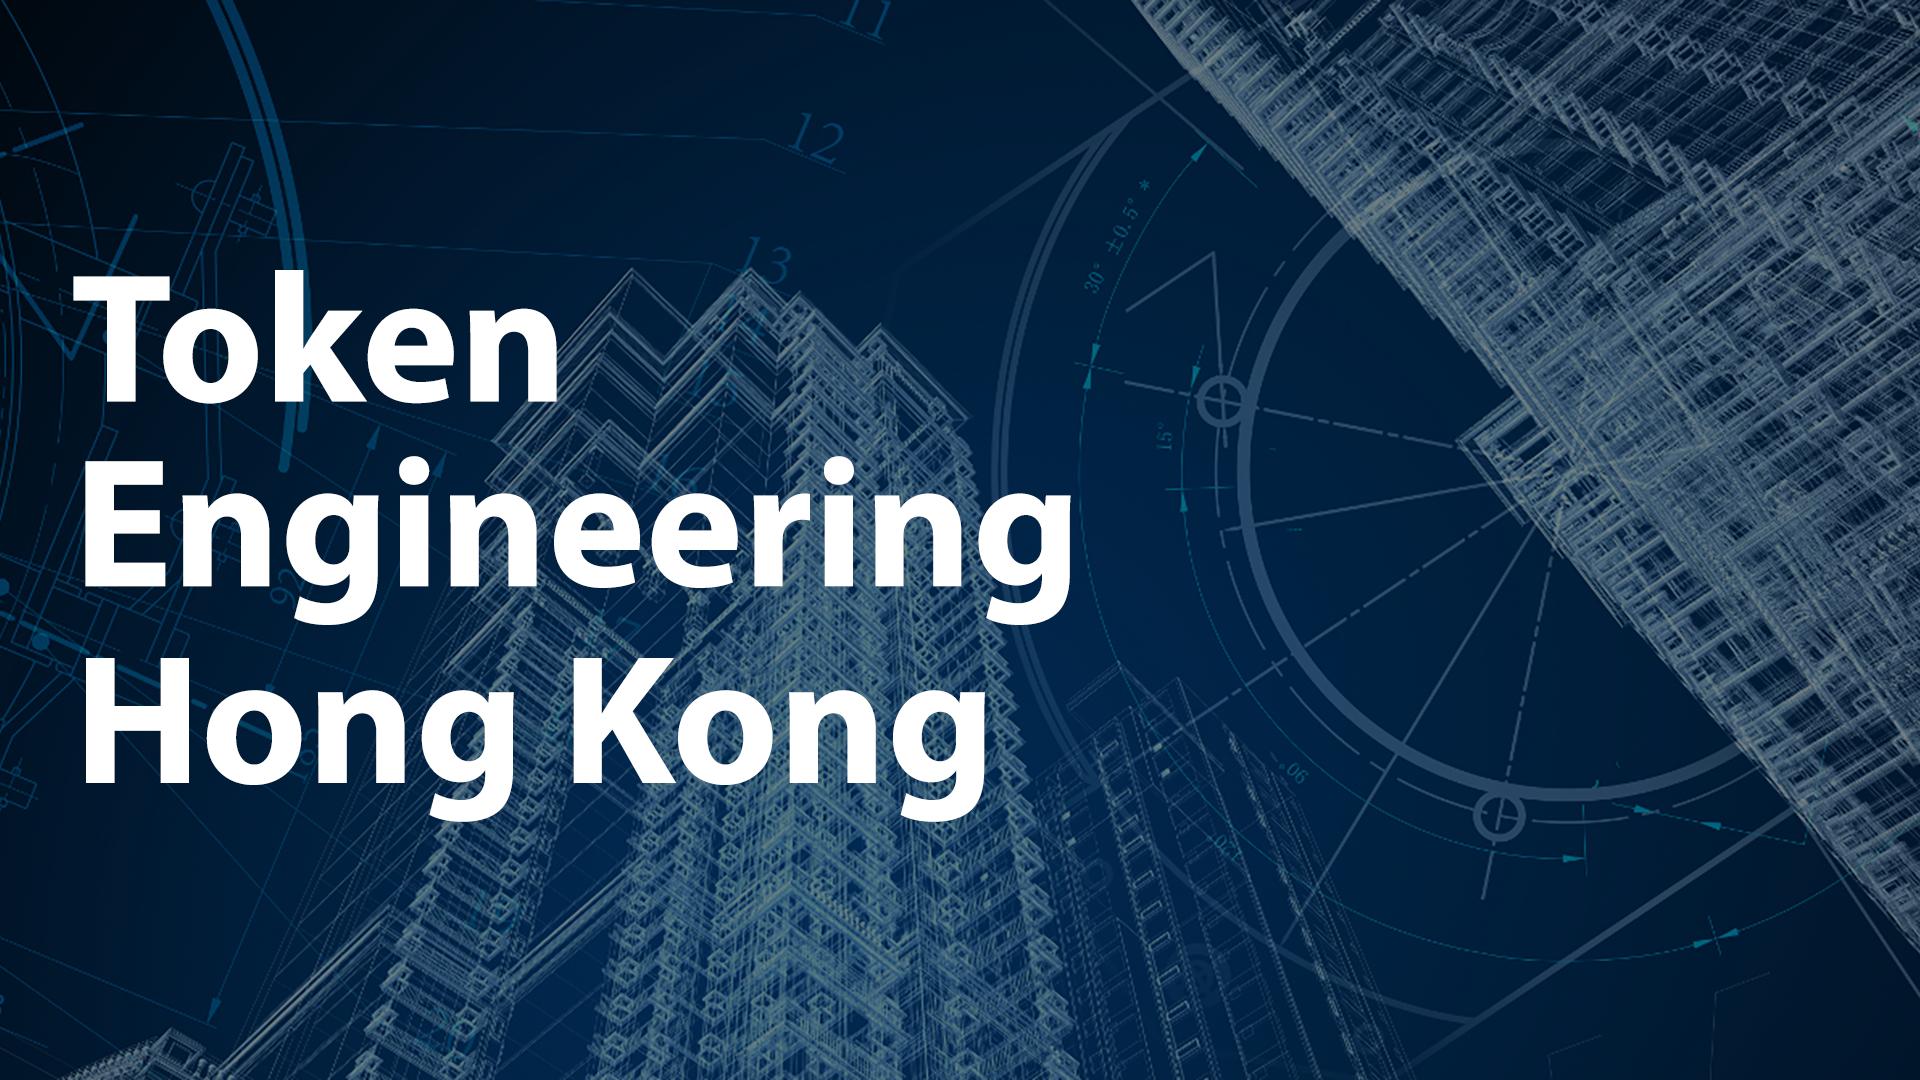 Token Engineering Hong Kong